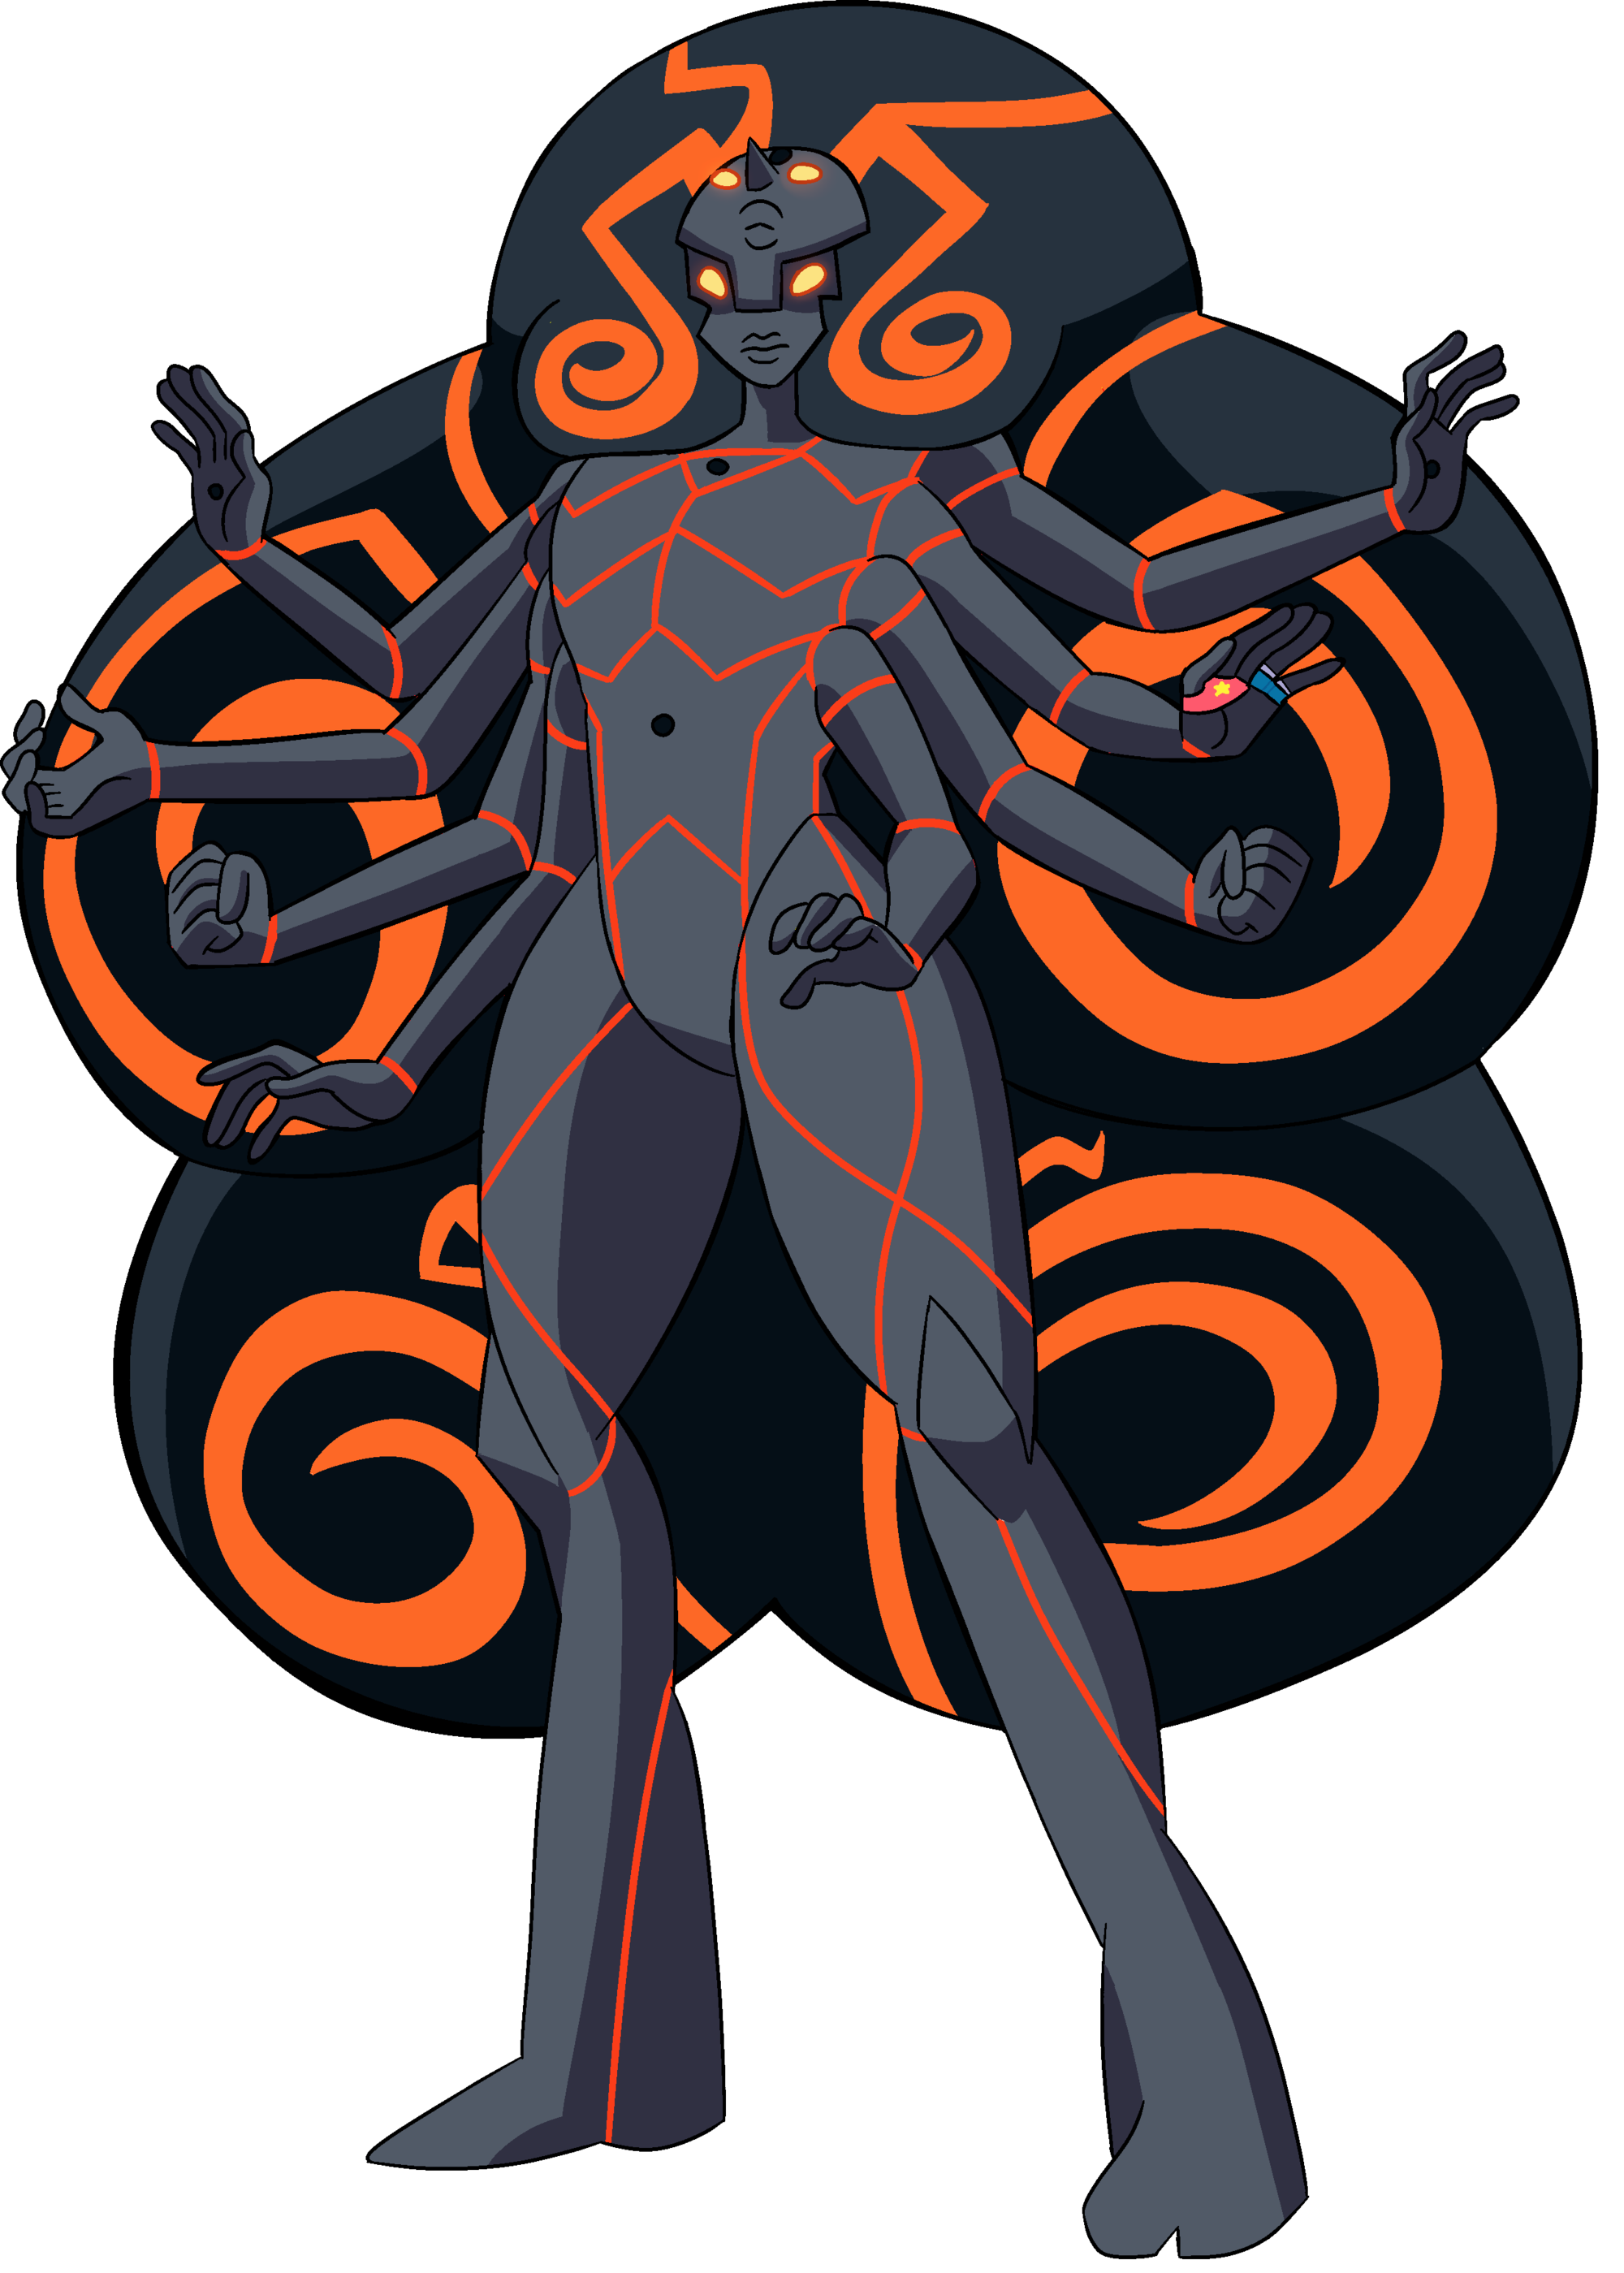 Obsidian (Steven fusion)